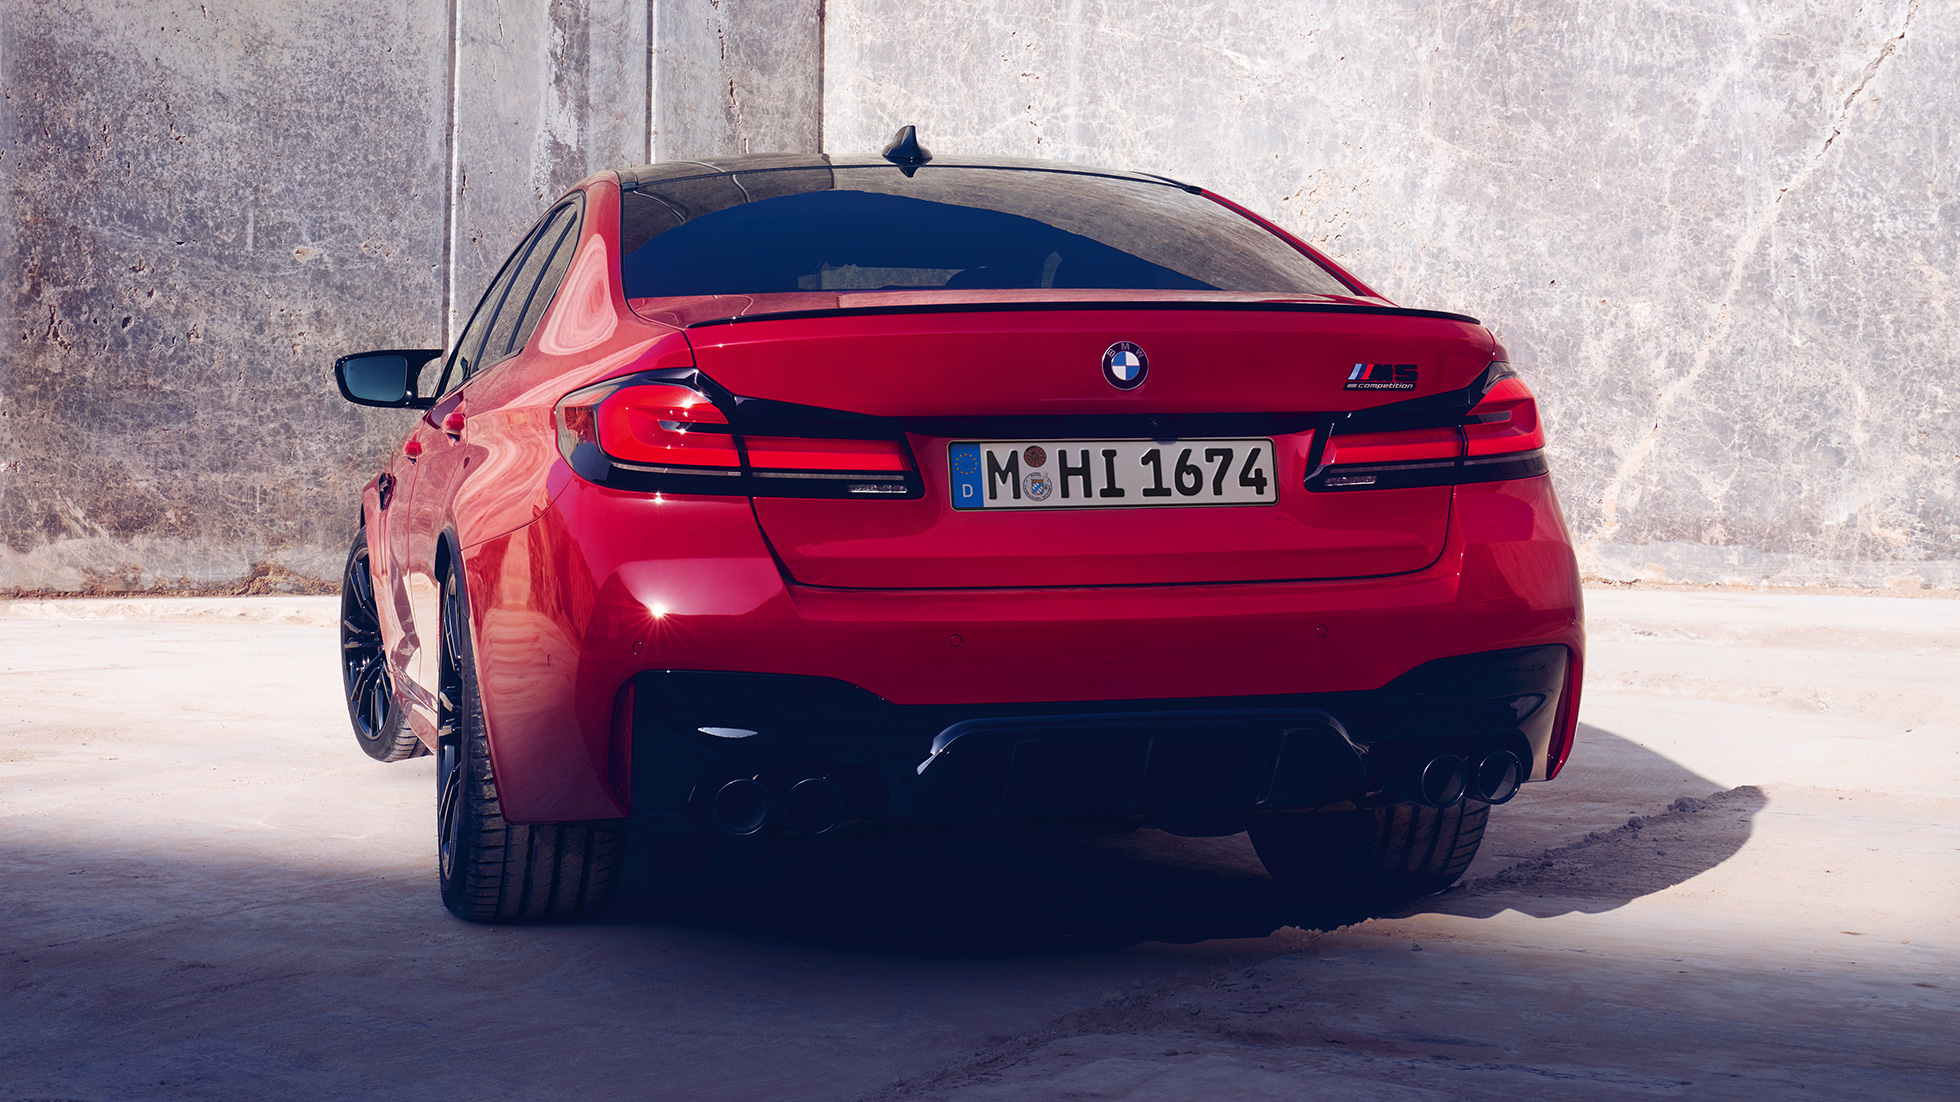 The M5 Bmw 5 Series Sedan M Automobiles Highlights Bmw South Africa